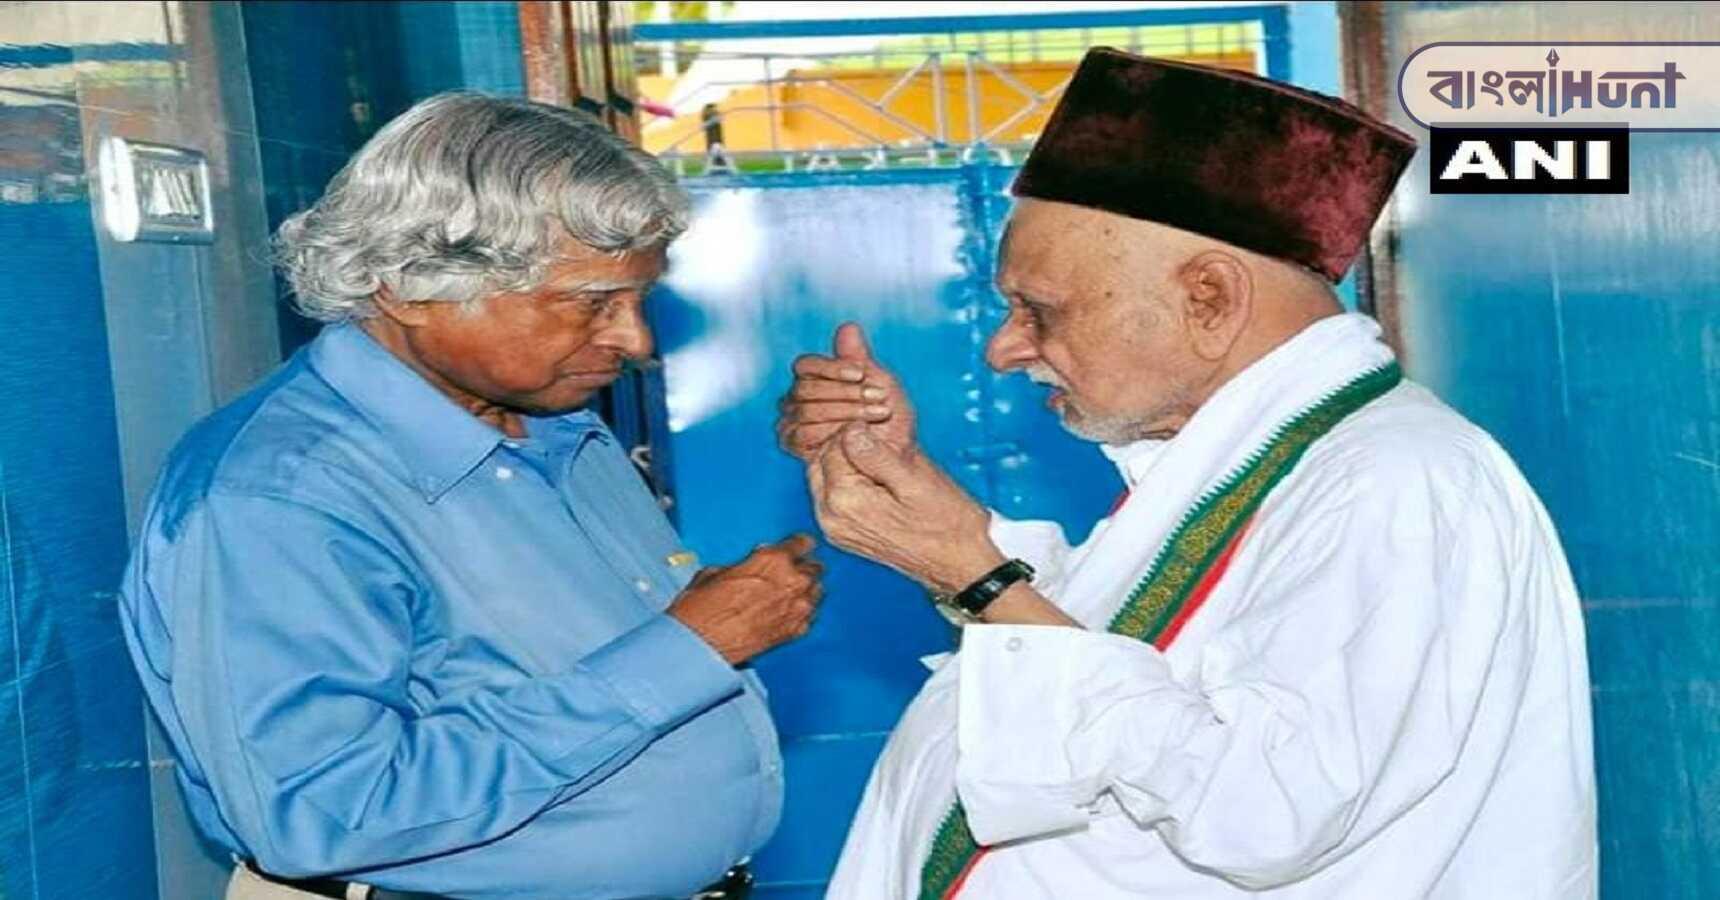 Dr. APJ Abdul Kalam's elder brother passed away at the age of 104